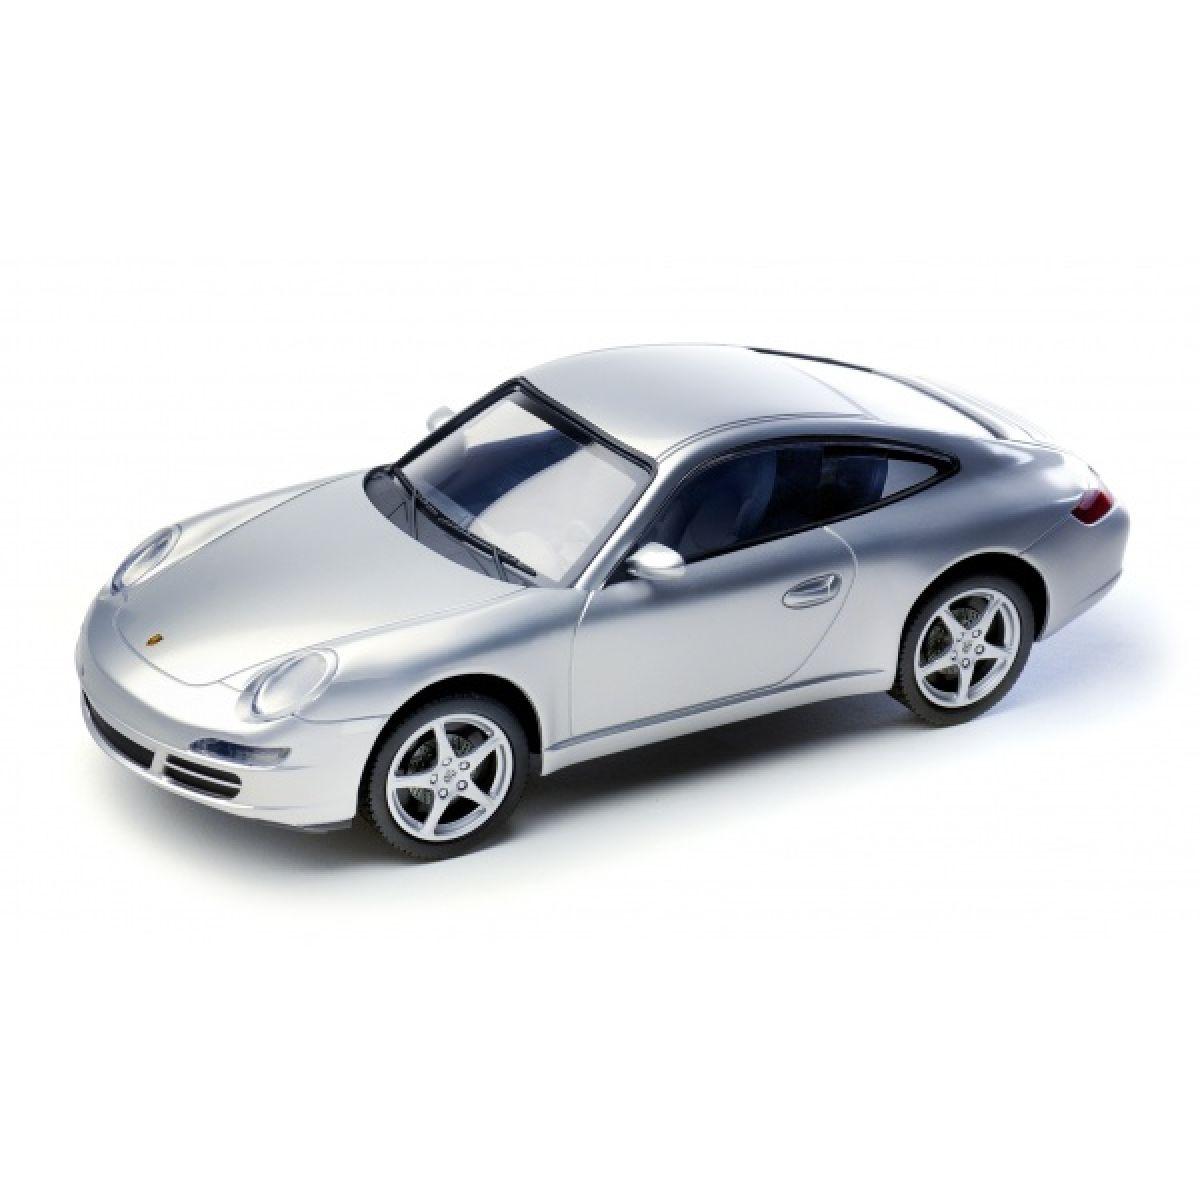 Silverlit RC Auto Porsche - 911 Carrera iPod, iPhone, iPad